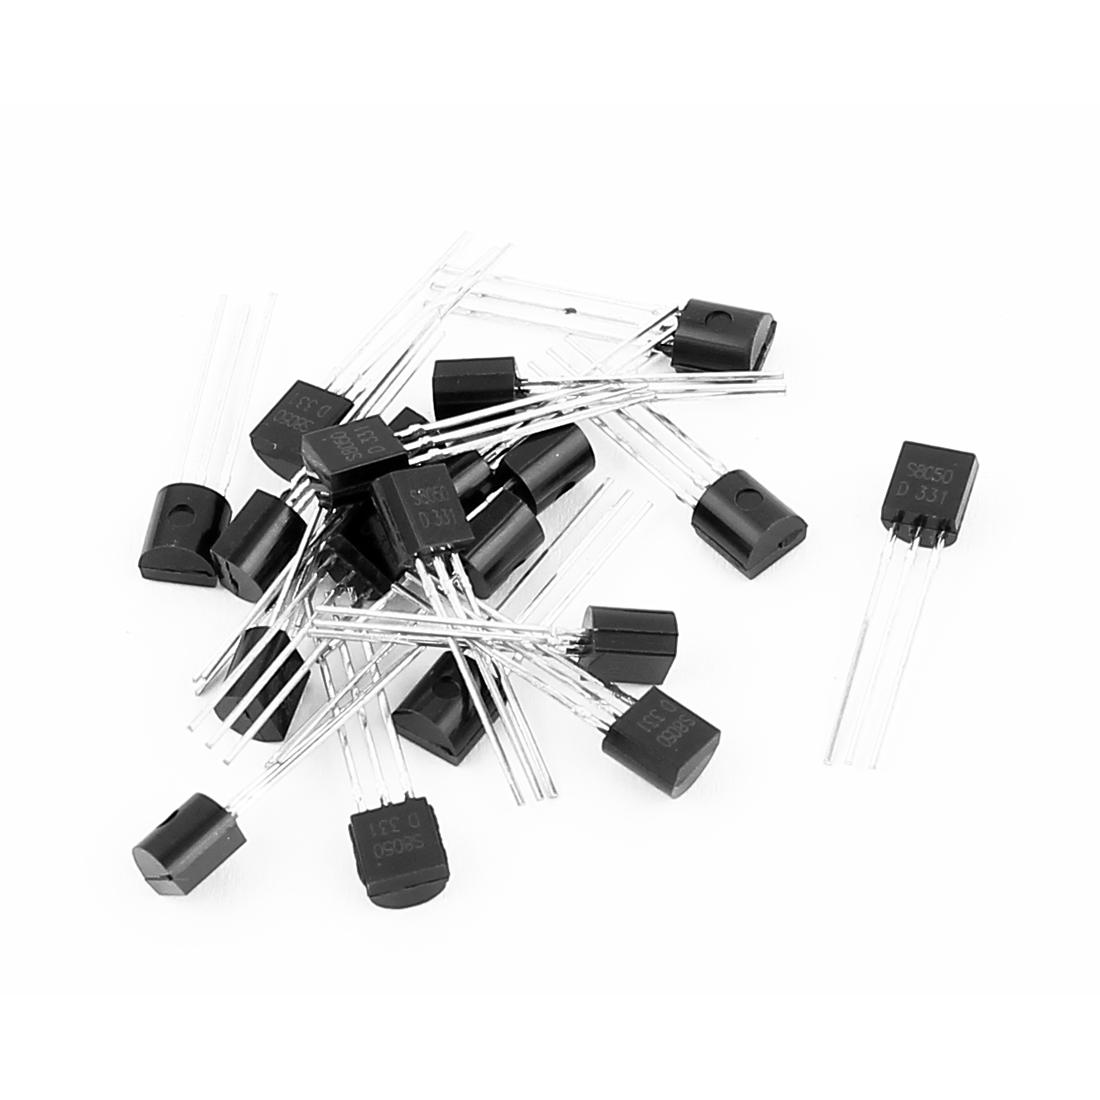 20 Pcs S8050 TO-92 NPN Bipolar Low Power Junction Transistors 40V 0.5A